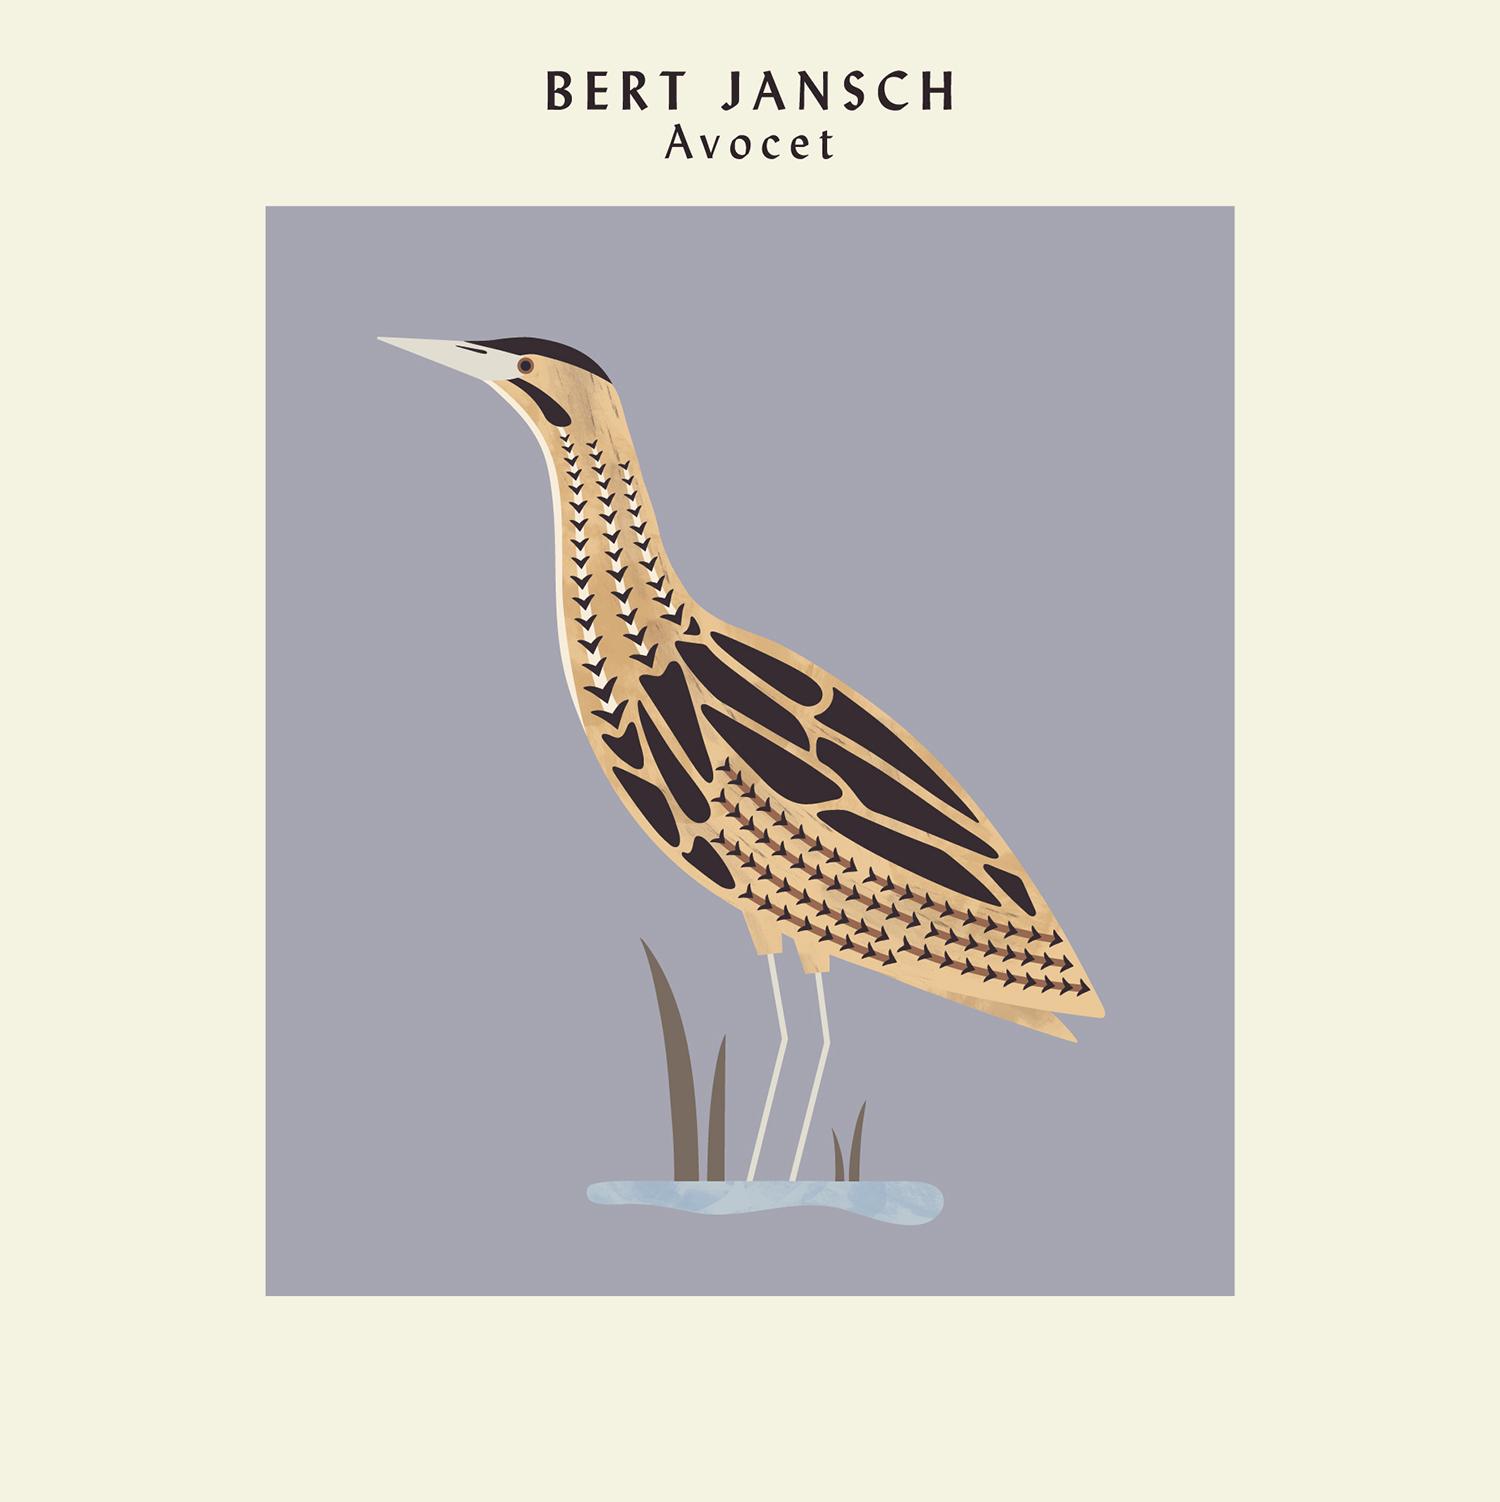 hannah-alice-bert-jansch-bittern-record-bird-illustration.jpg